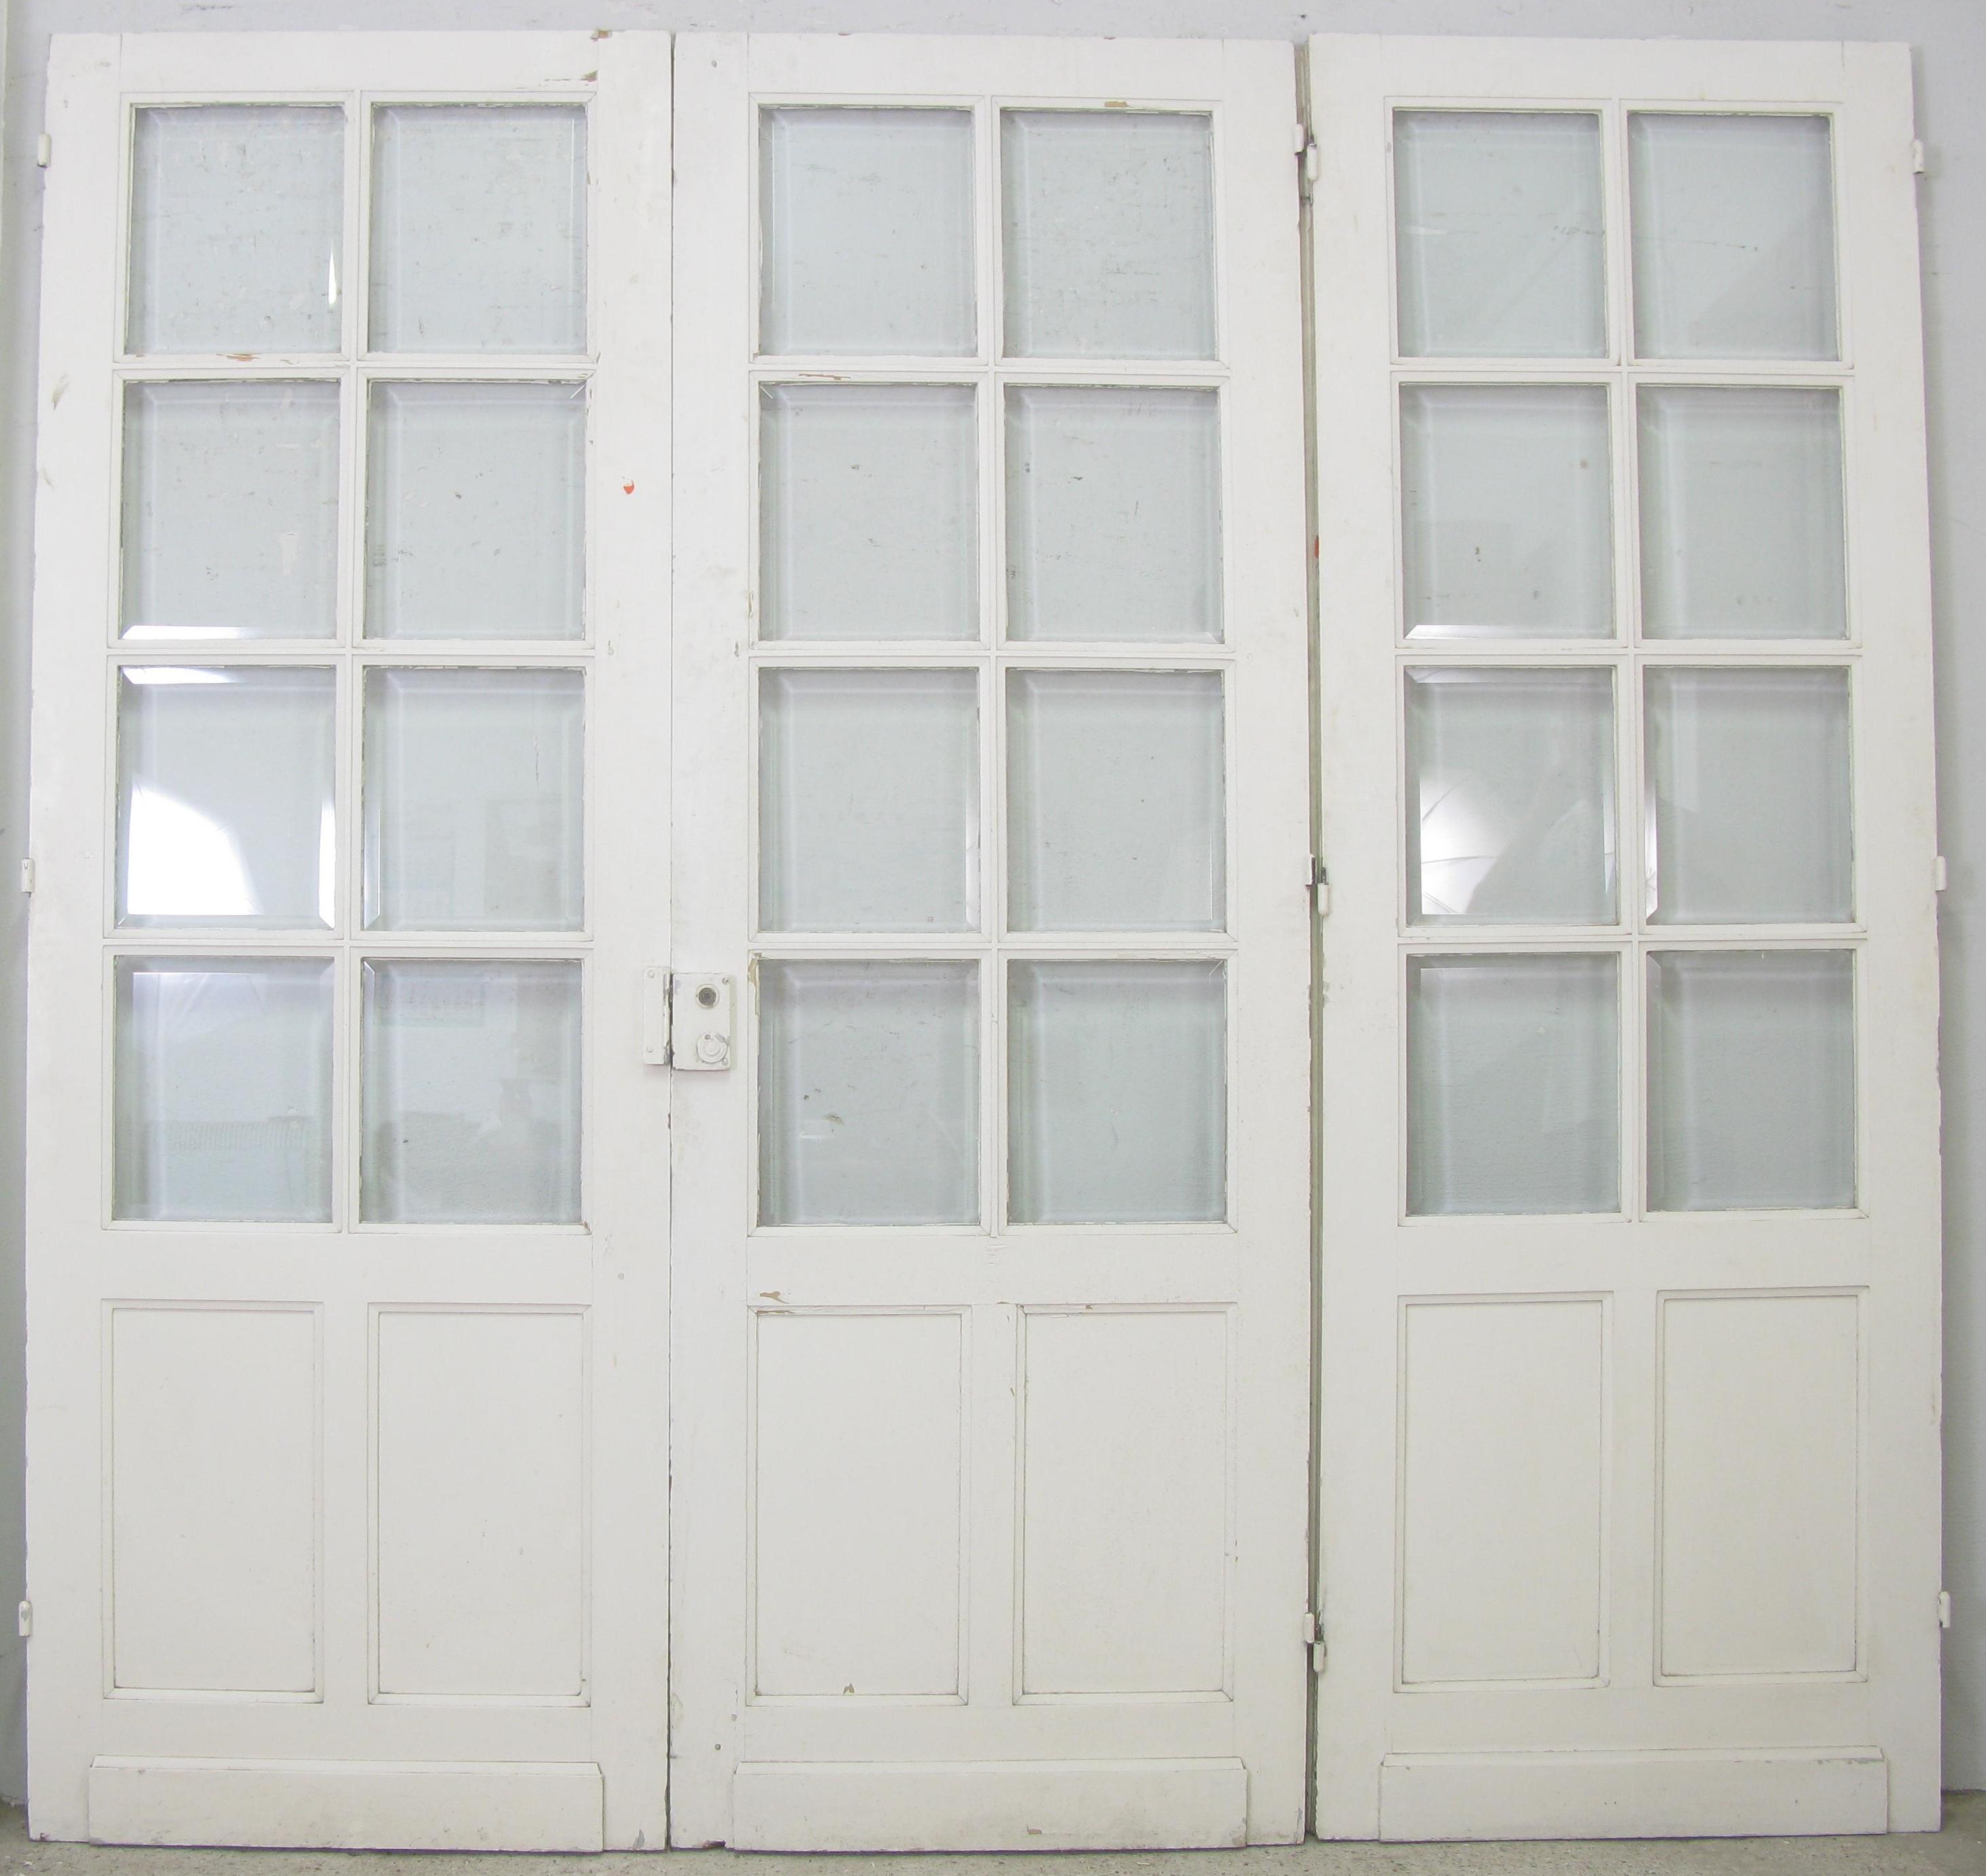 3 fl gelige franz sische fl gelt r jugendstil mit facettenschliff glas historische. Black Bedroom Furniture Sets. Home Design Ideas